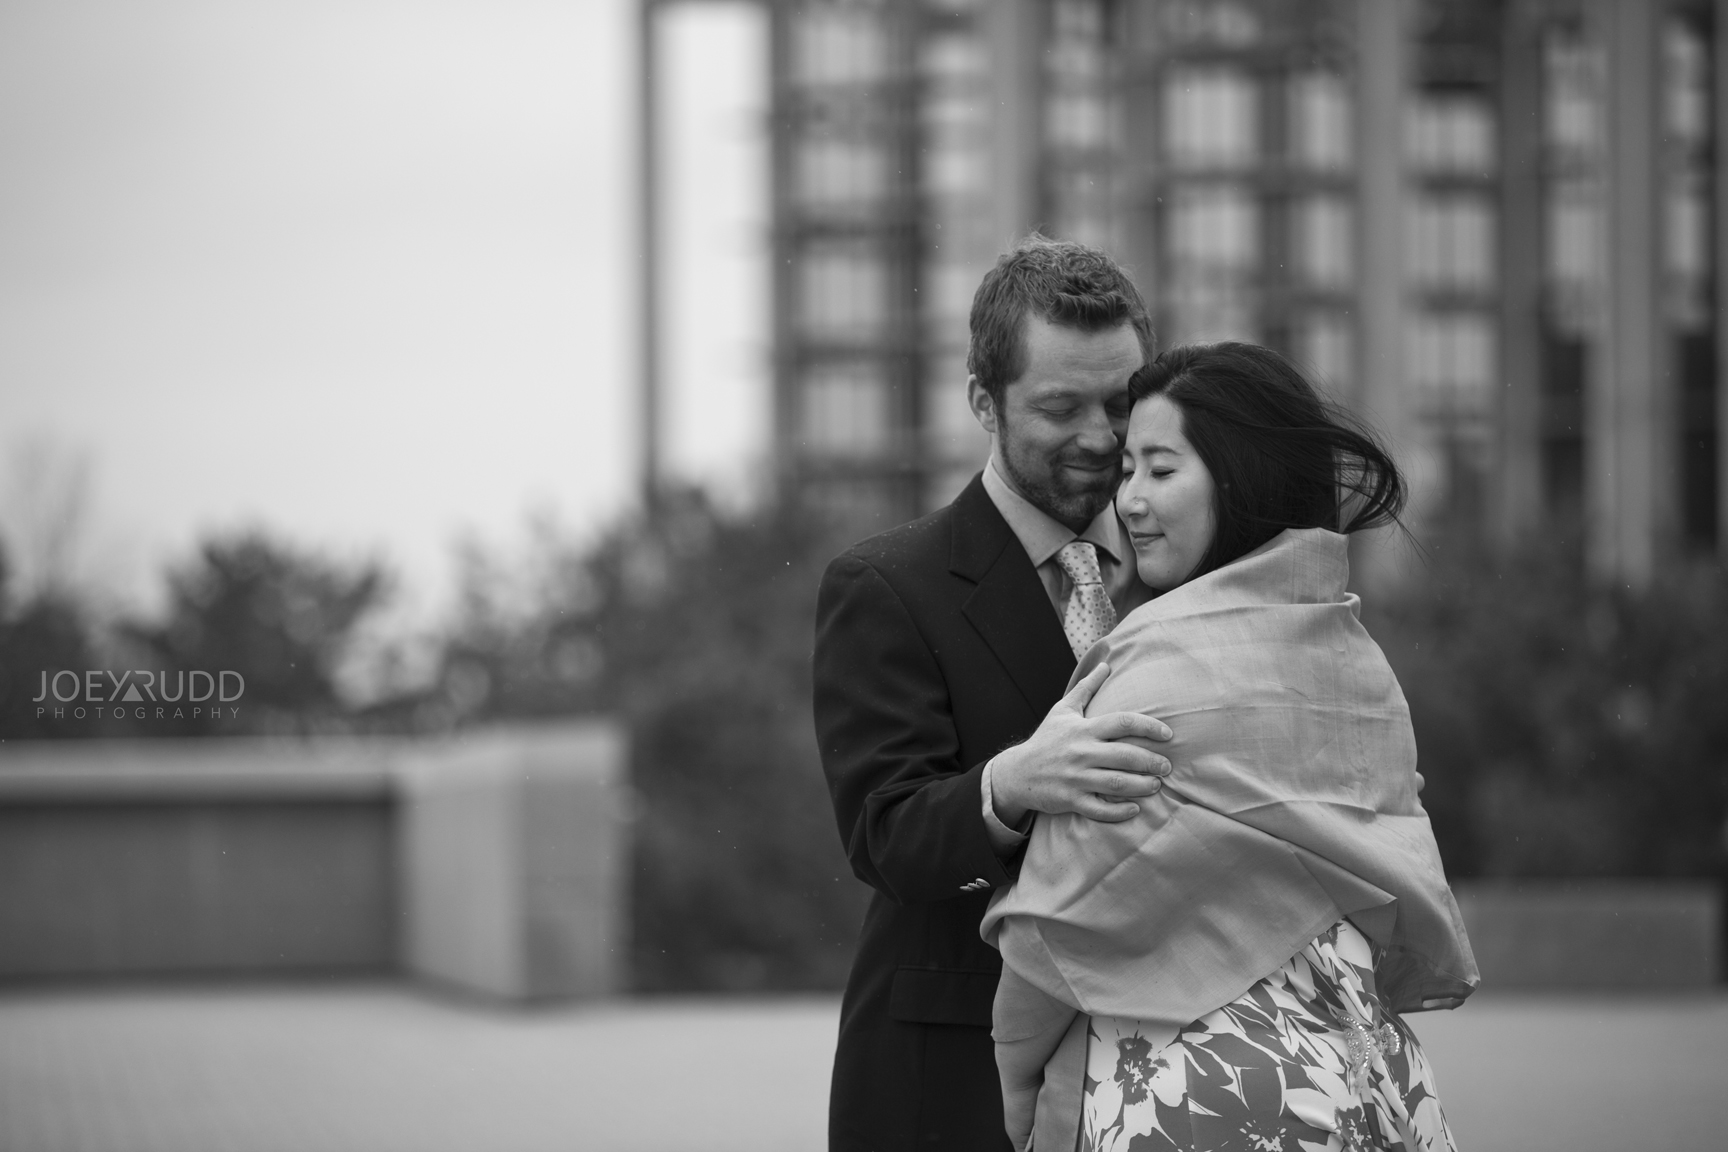 Ottawa Elopement Wedding Photographer Joey Rudd Photography Art Gallery